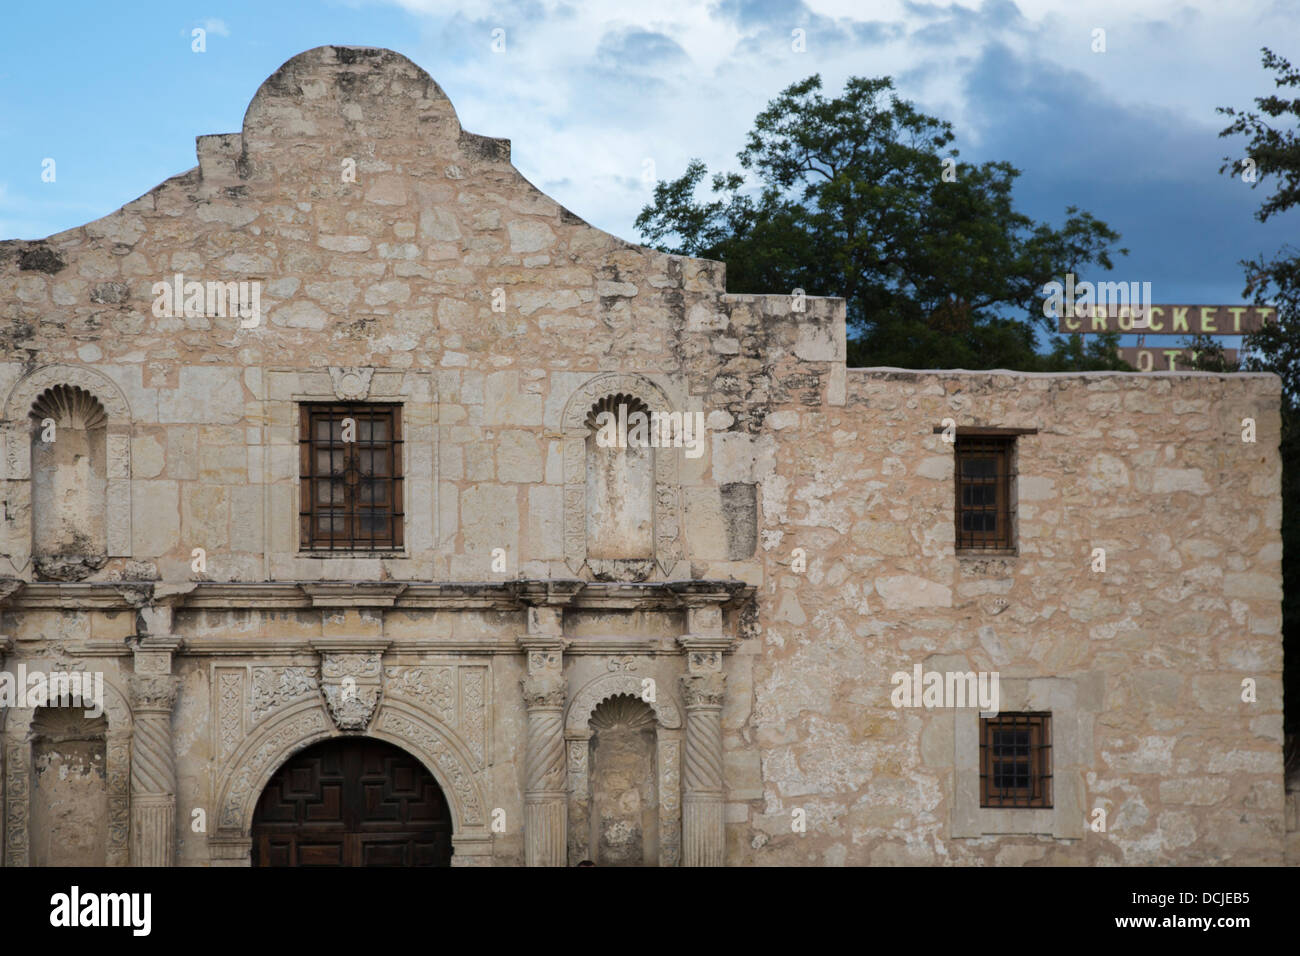 The Alamo - Stock Image